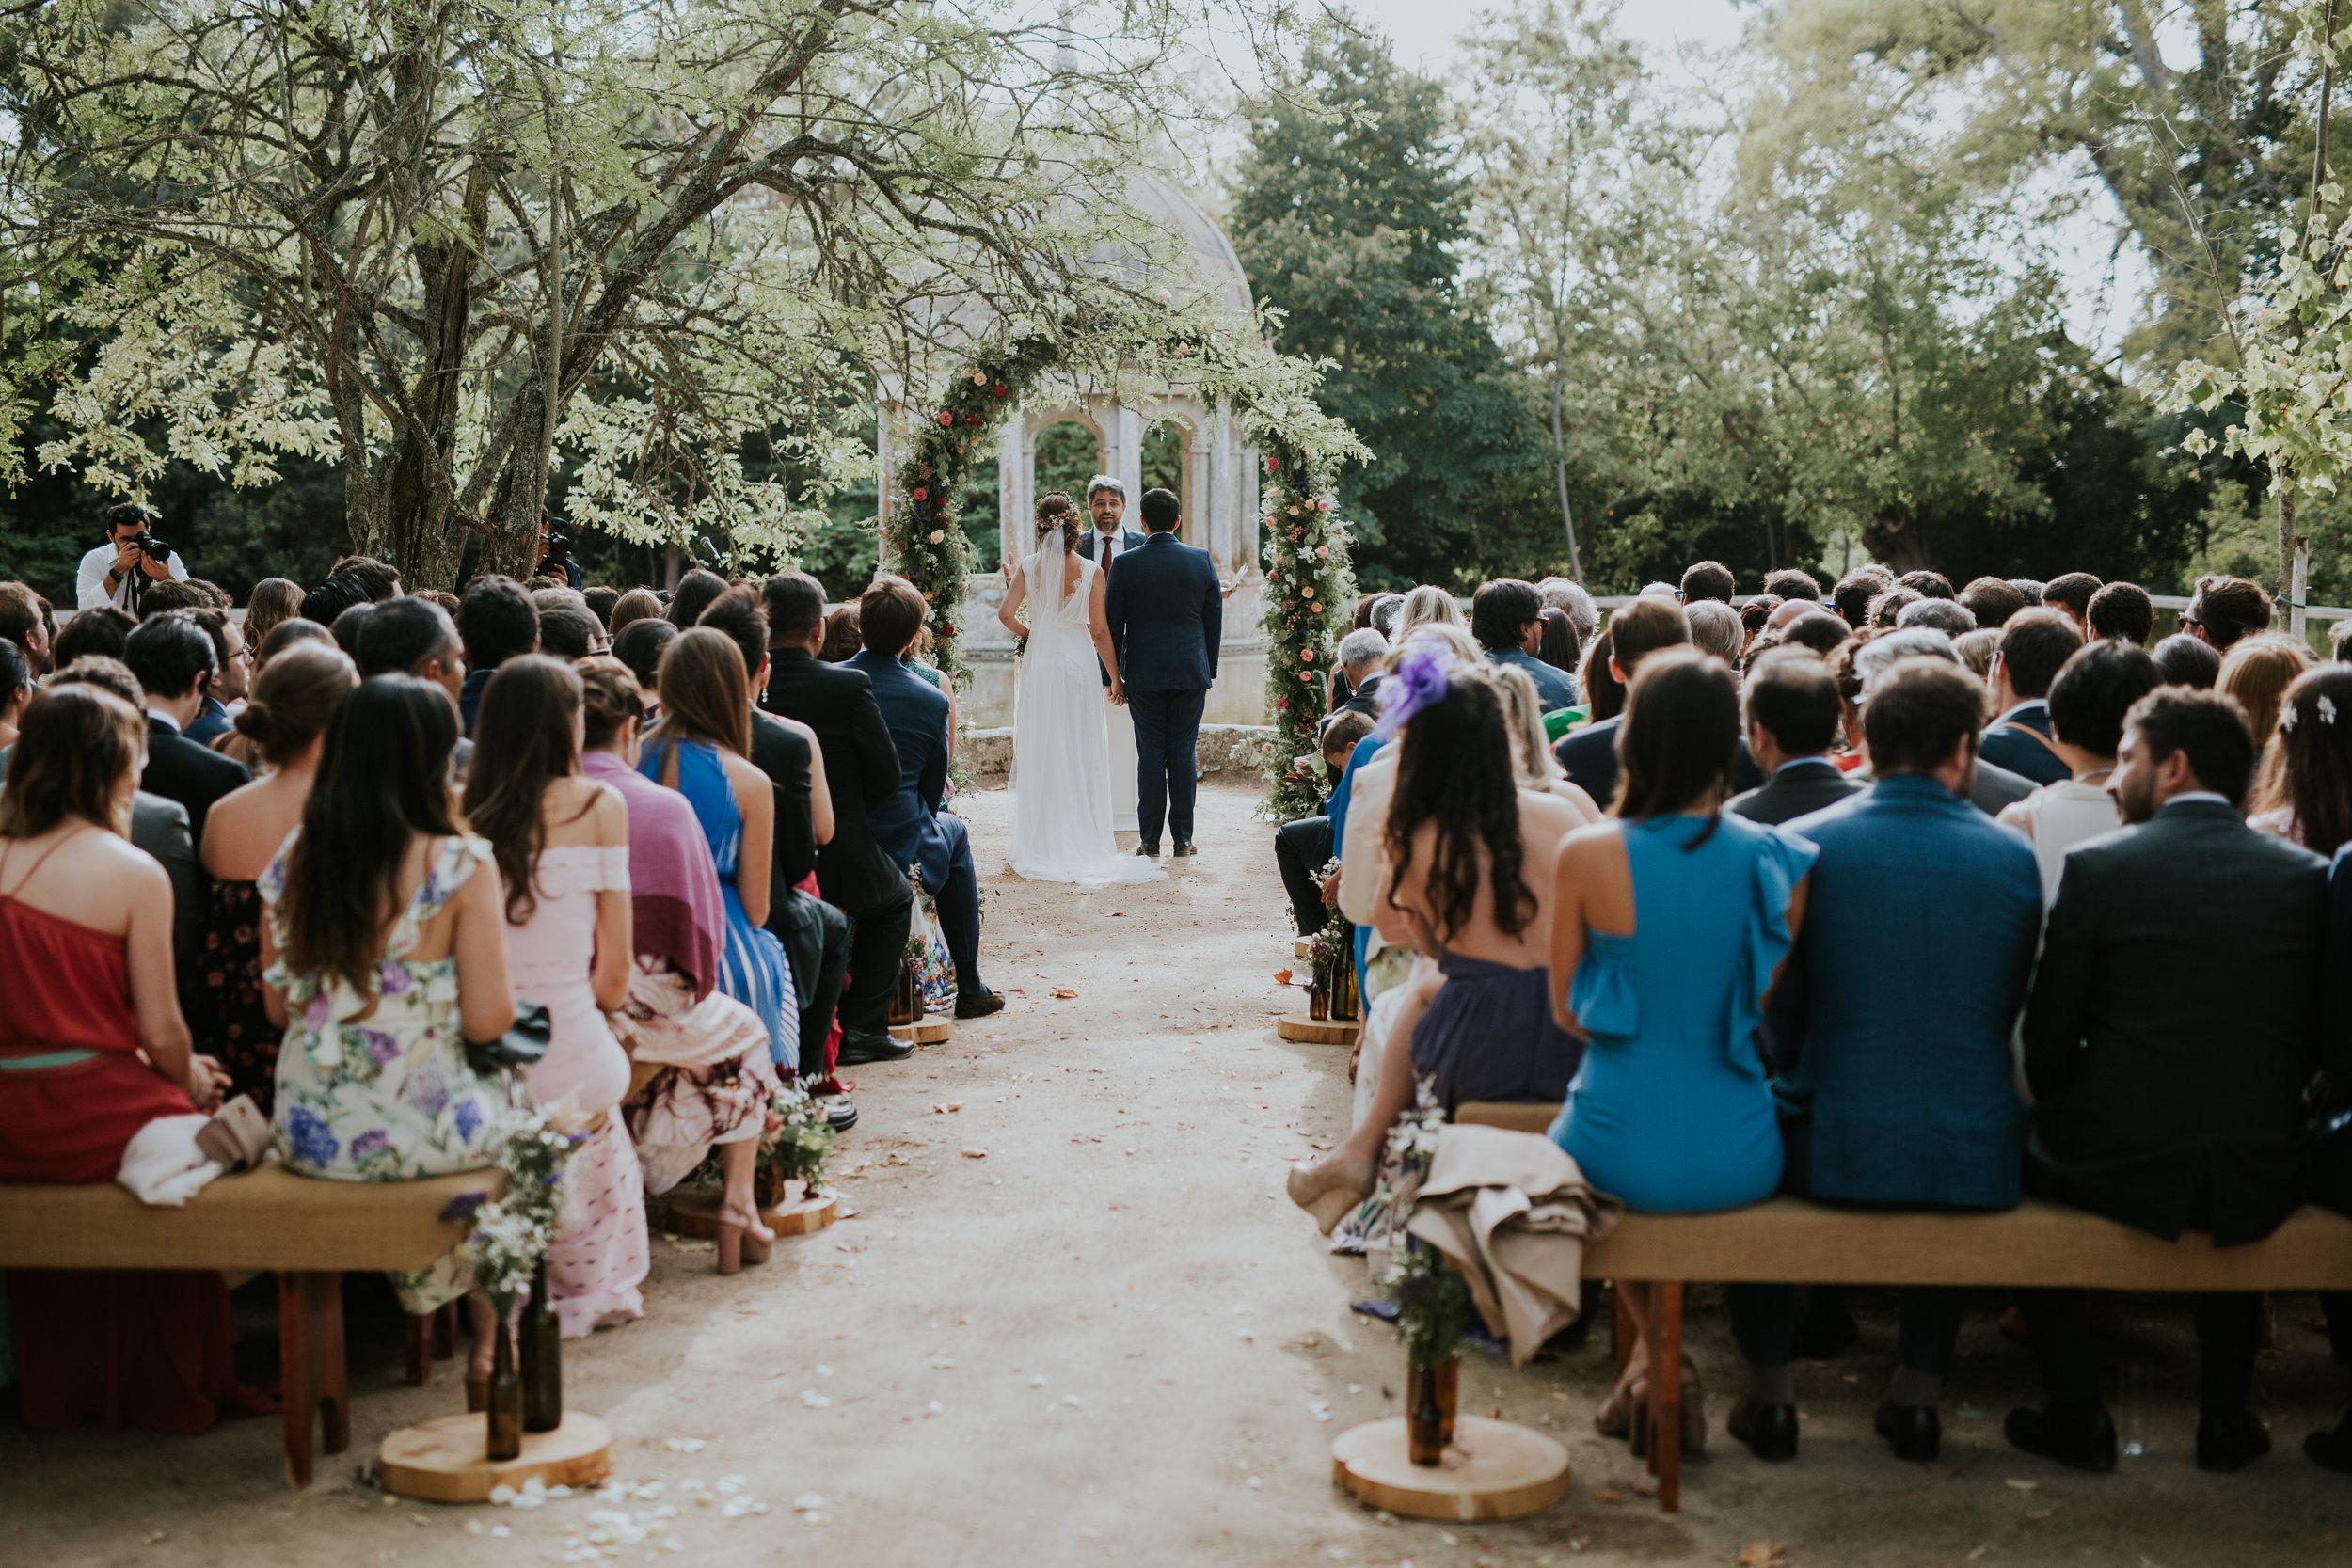 R&J231_ 09 setembro 2017 Wedding day_.jpg